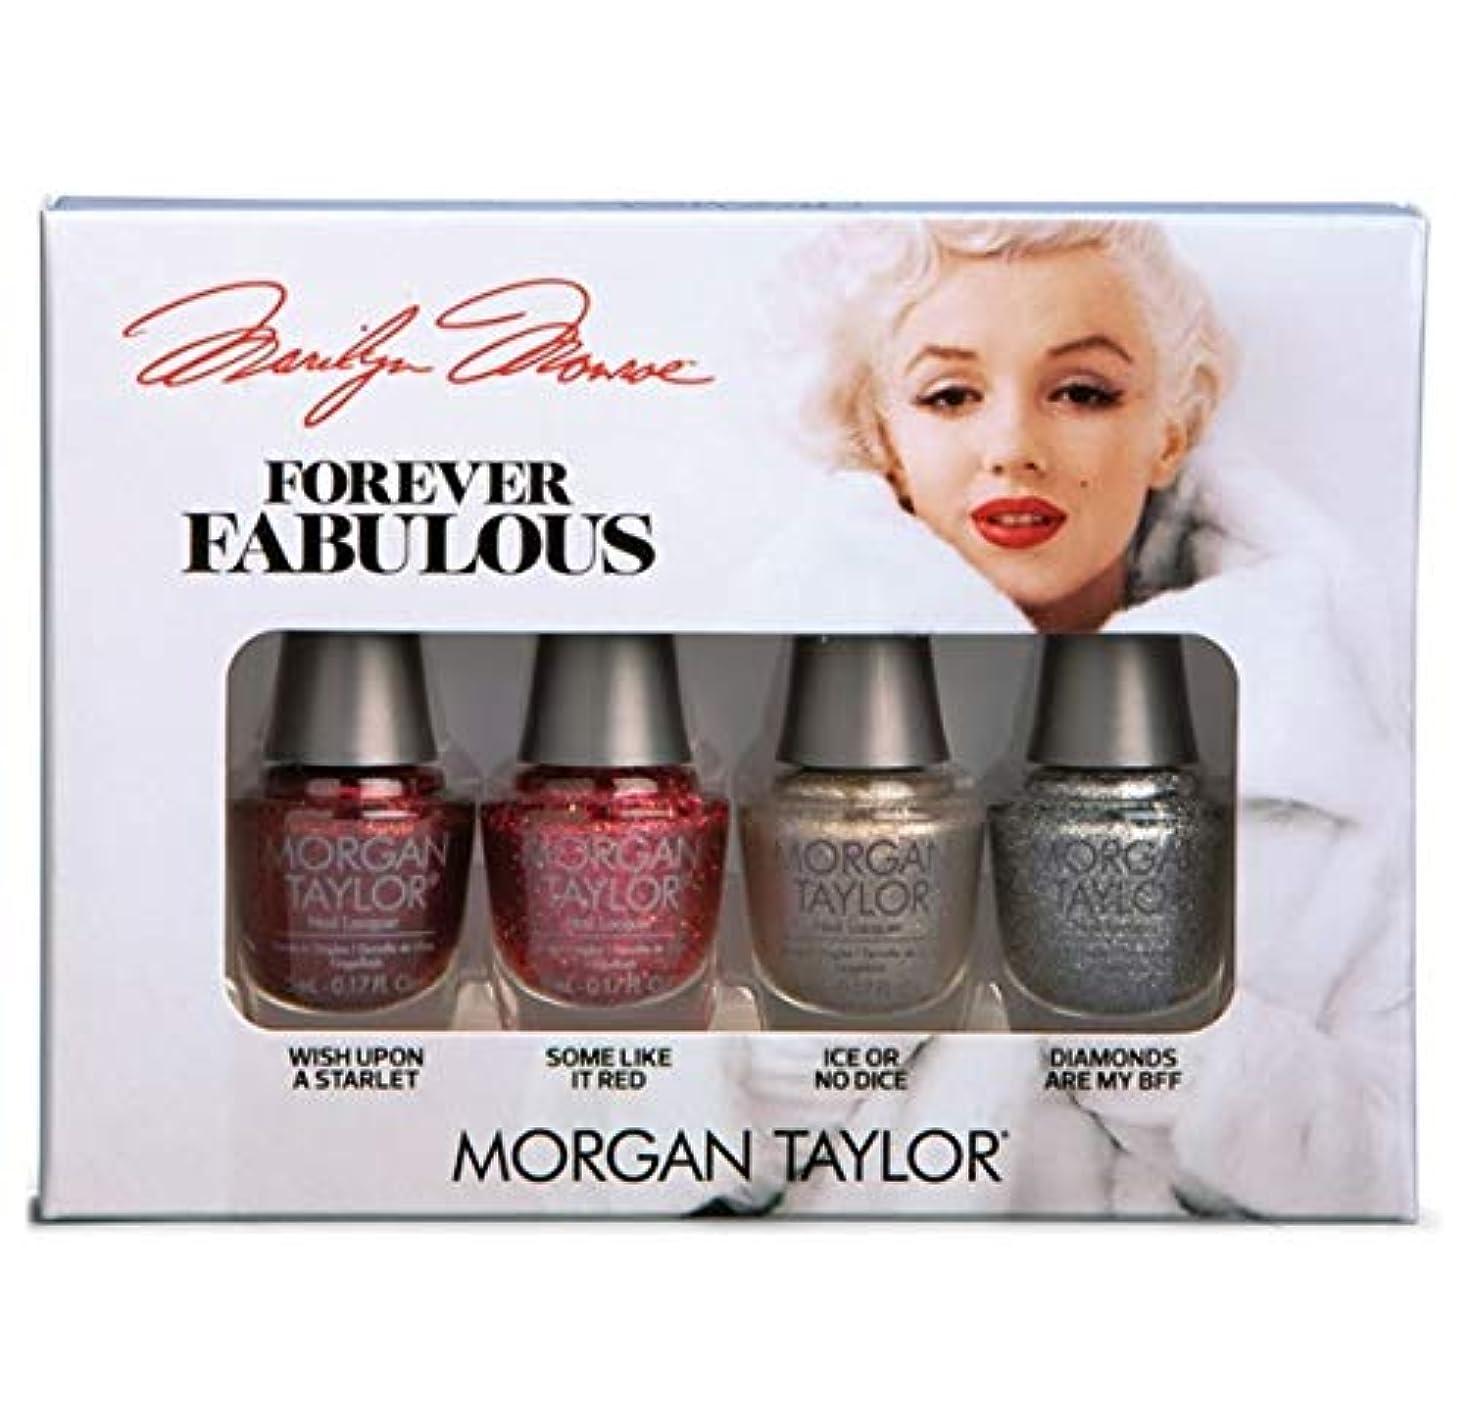 Morgan Taylor - Forever Fabulous Marilyn Monroe Mini 4 Pack - Glitter - 5 mL / 0.17 oz